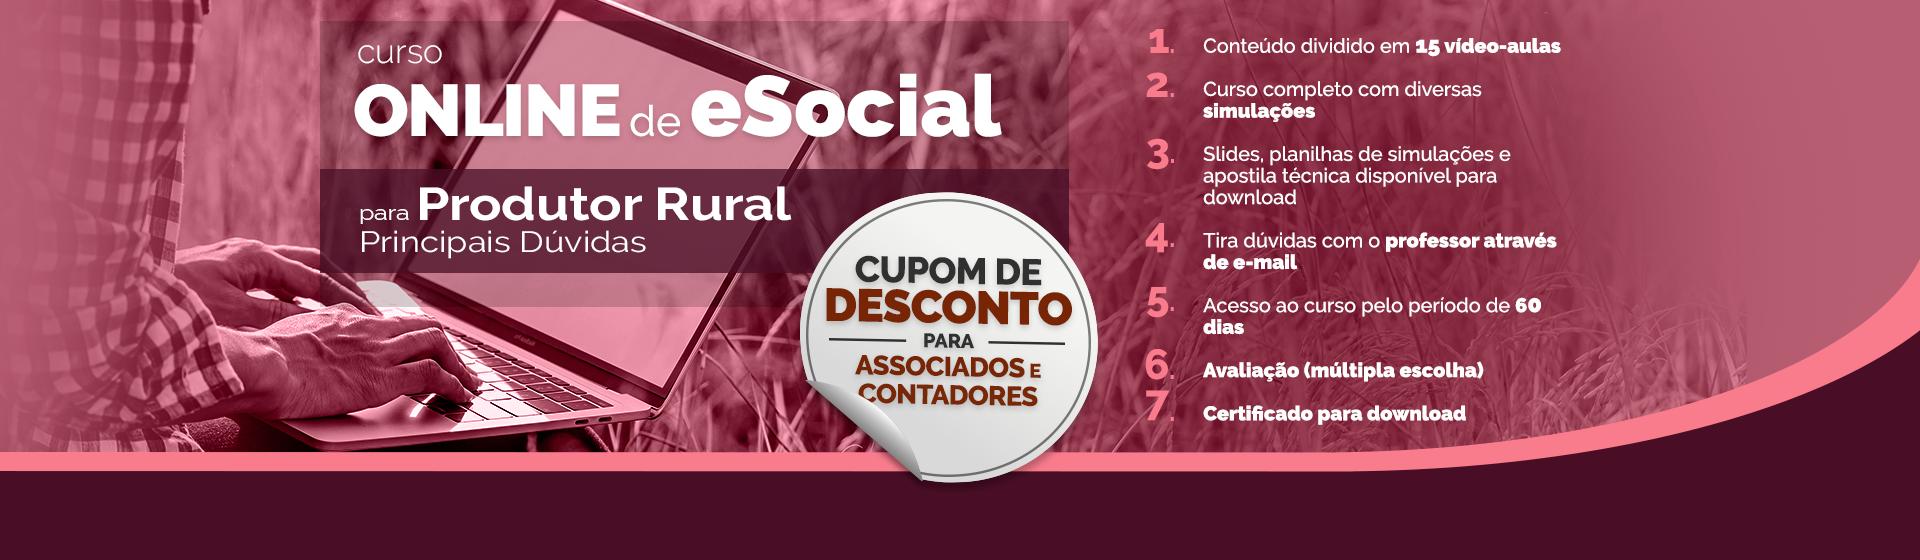 Esocial produtor rural 1920x560